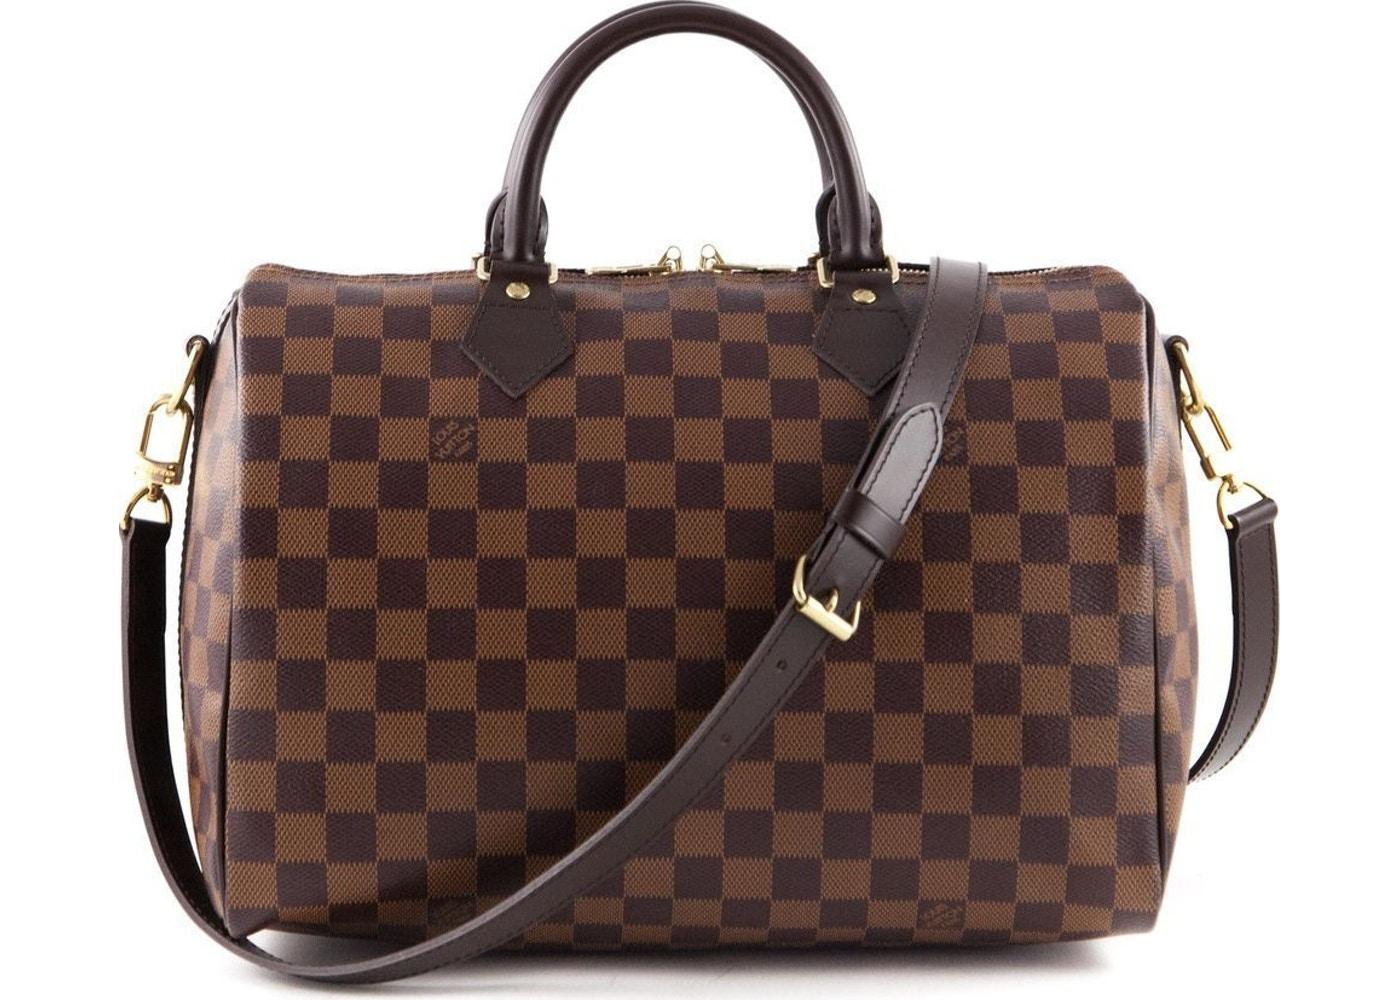 e25f596e768e The Fabulous Designer Bag Collection of Meghan Markle .